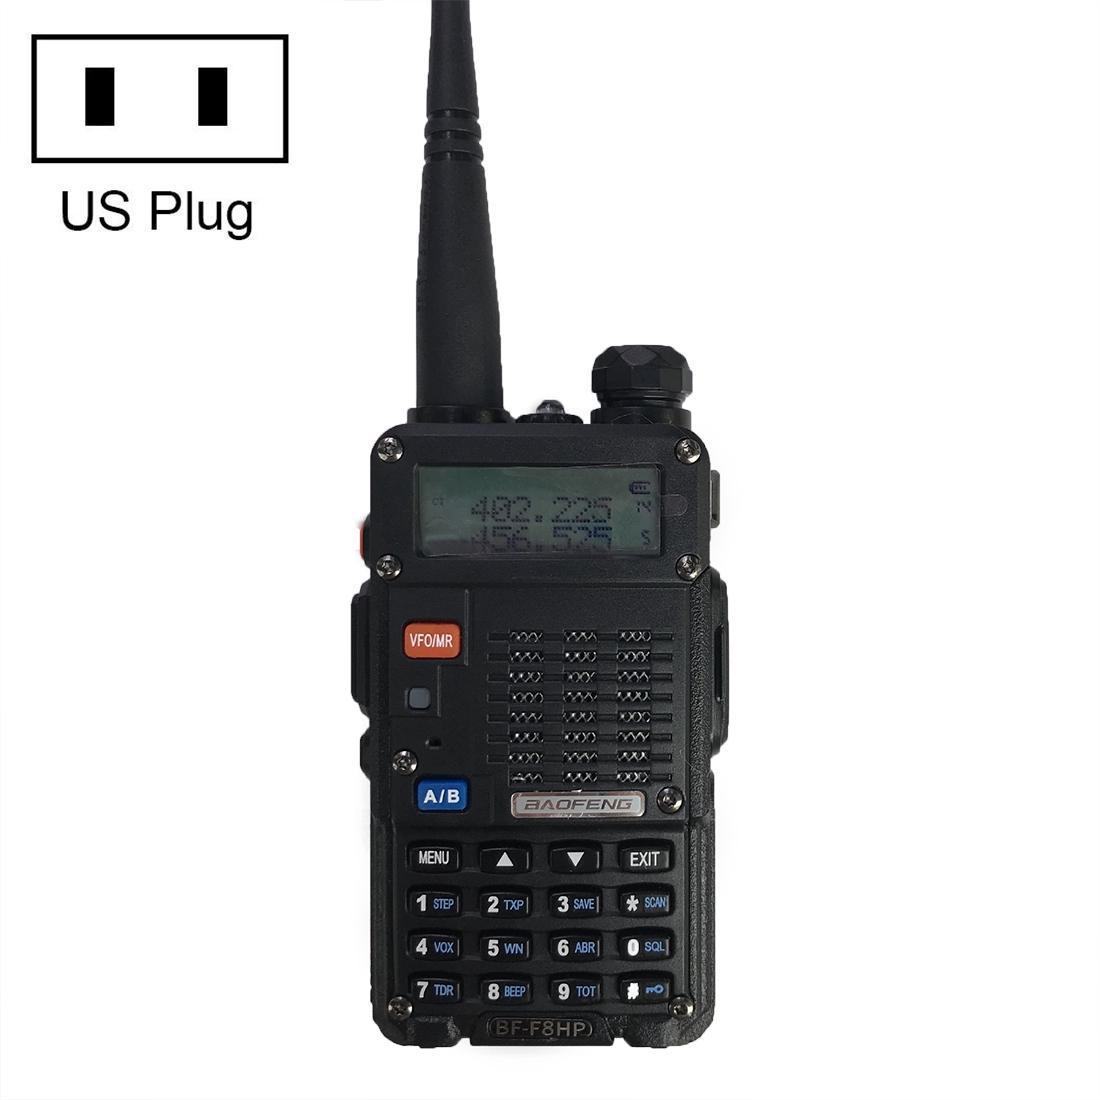 Baofeng BF-F8HP 8W двухдиапазонный двусторонней радиосвязи УКВ Handheld Walkie Talkie штепсельной вилки США